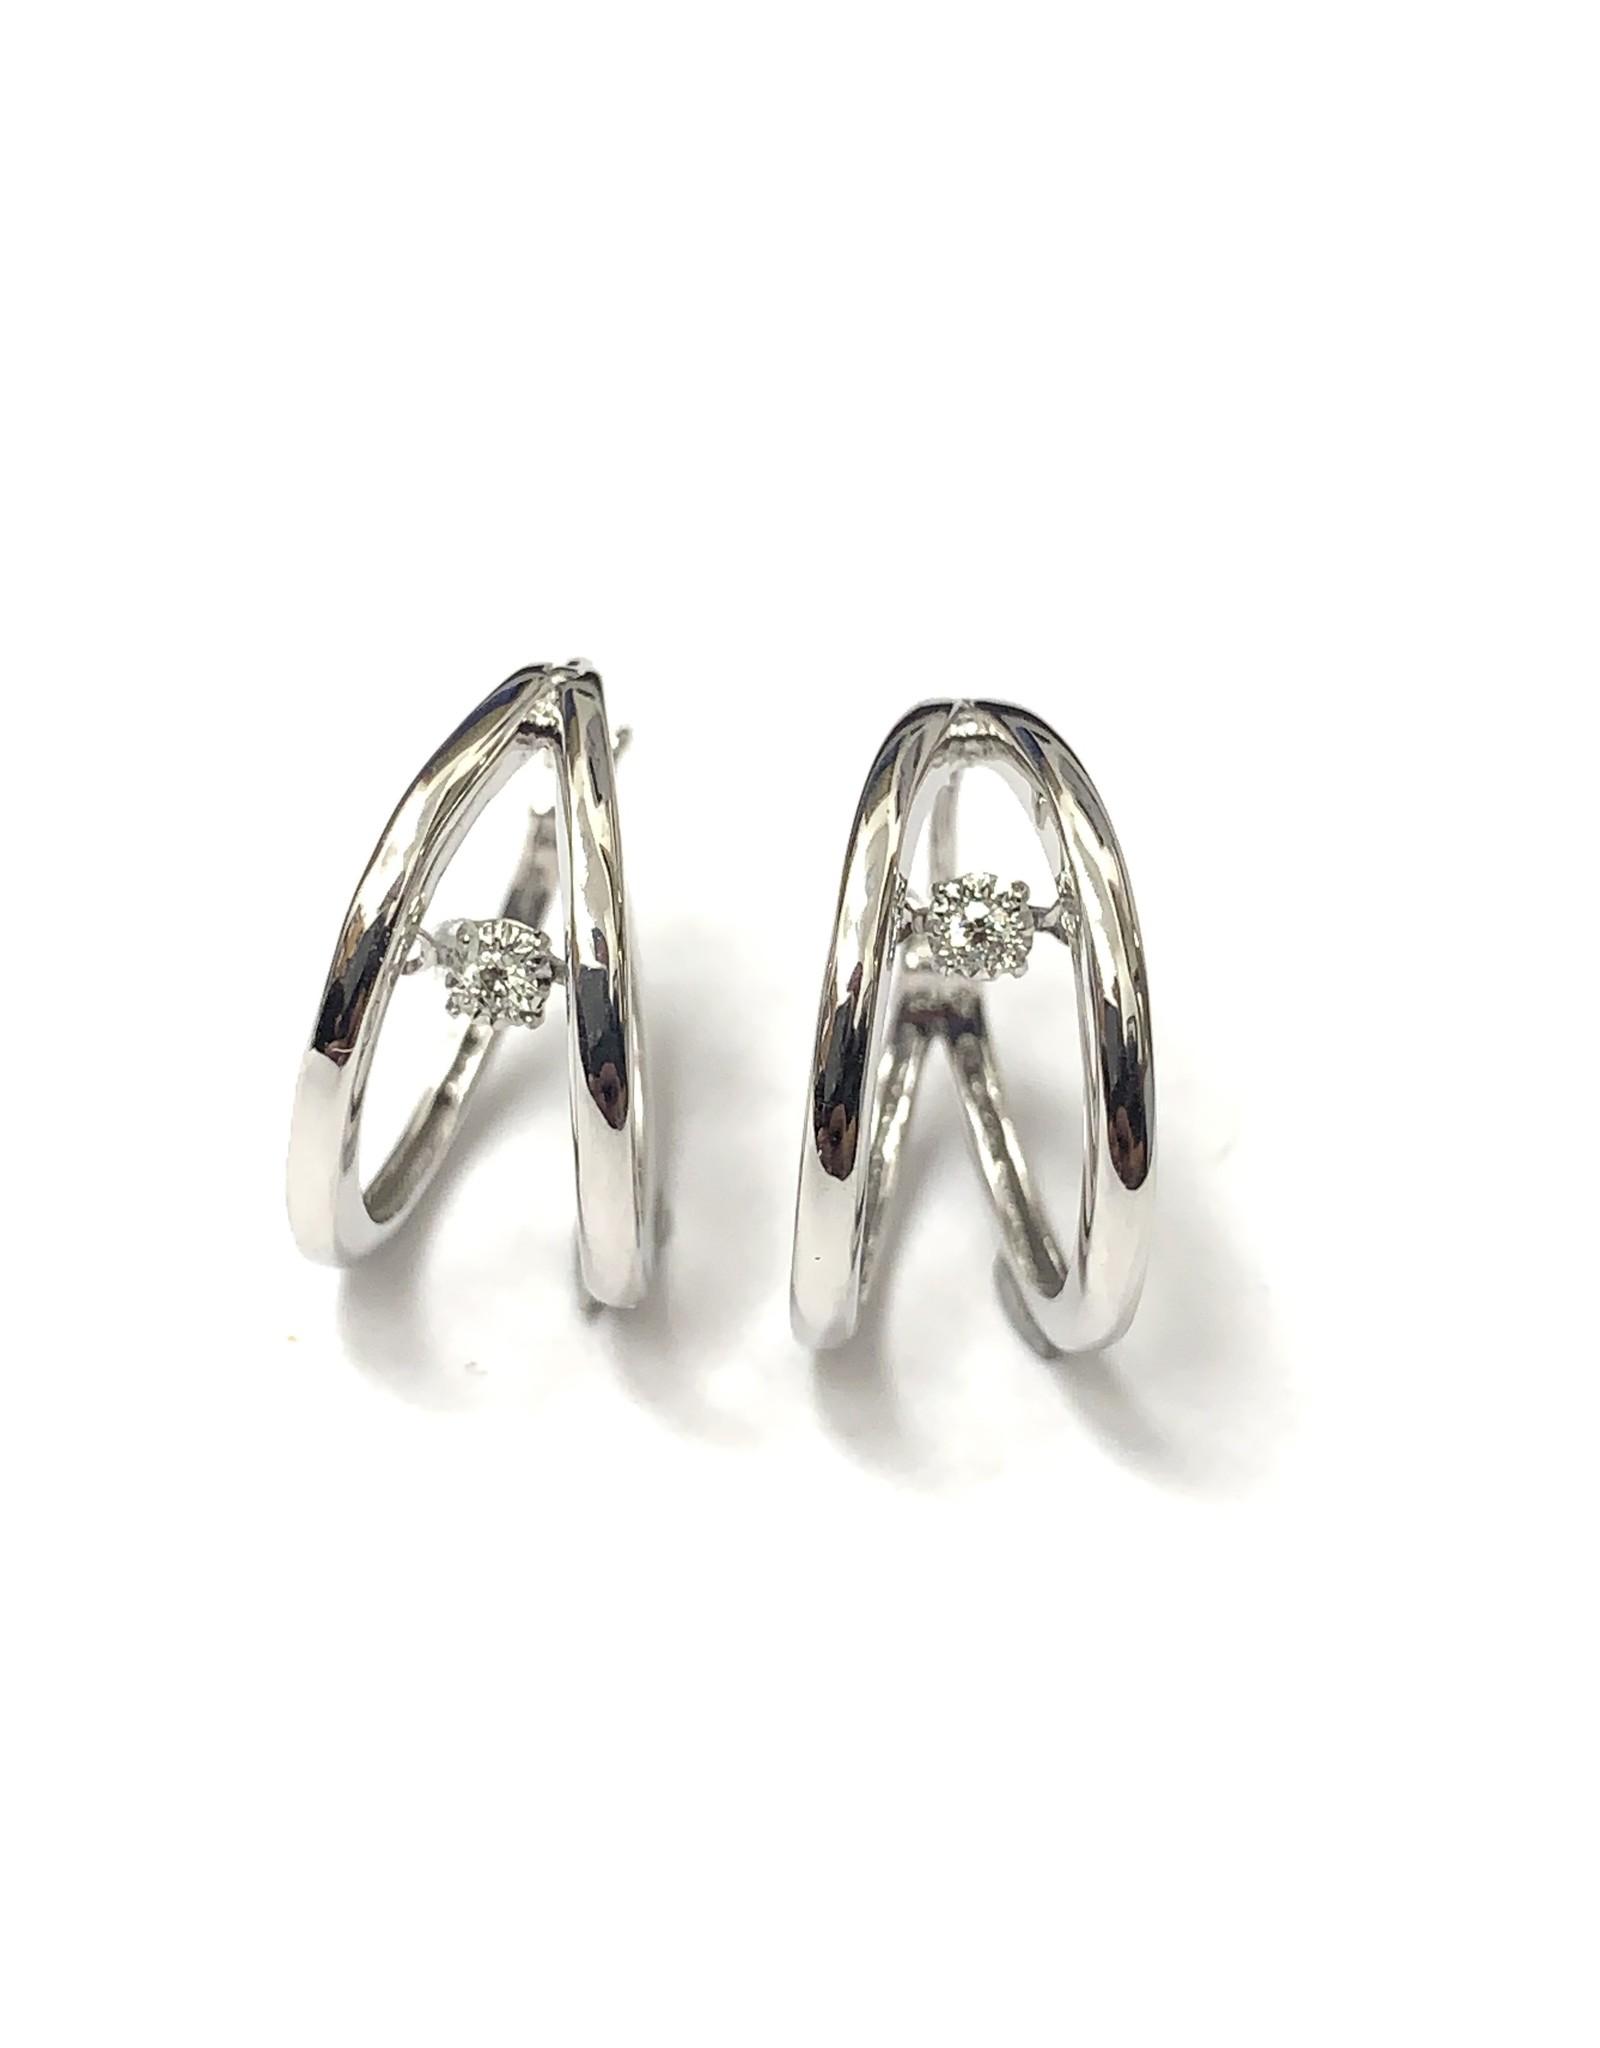 Dancing Diamond Earrings 10KW